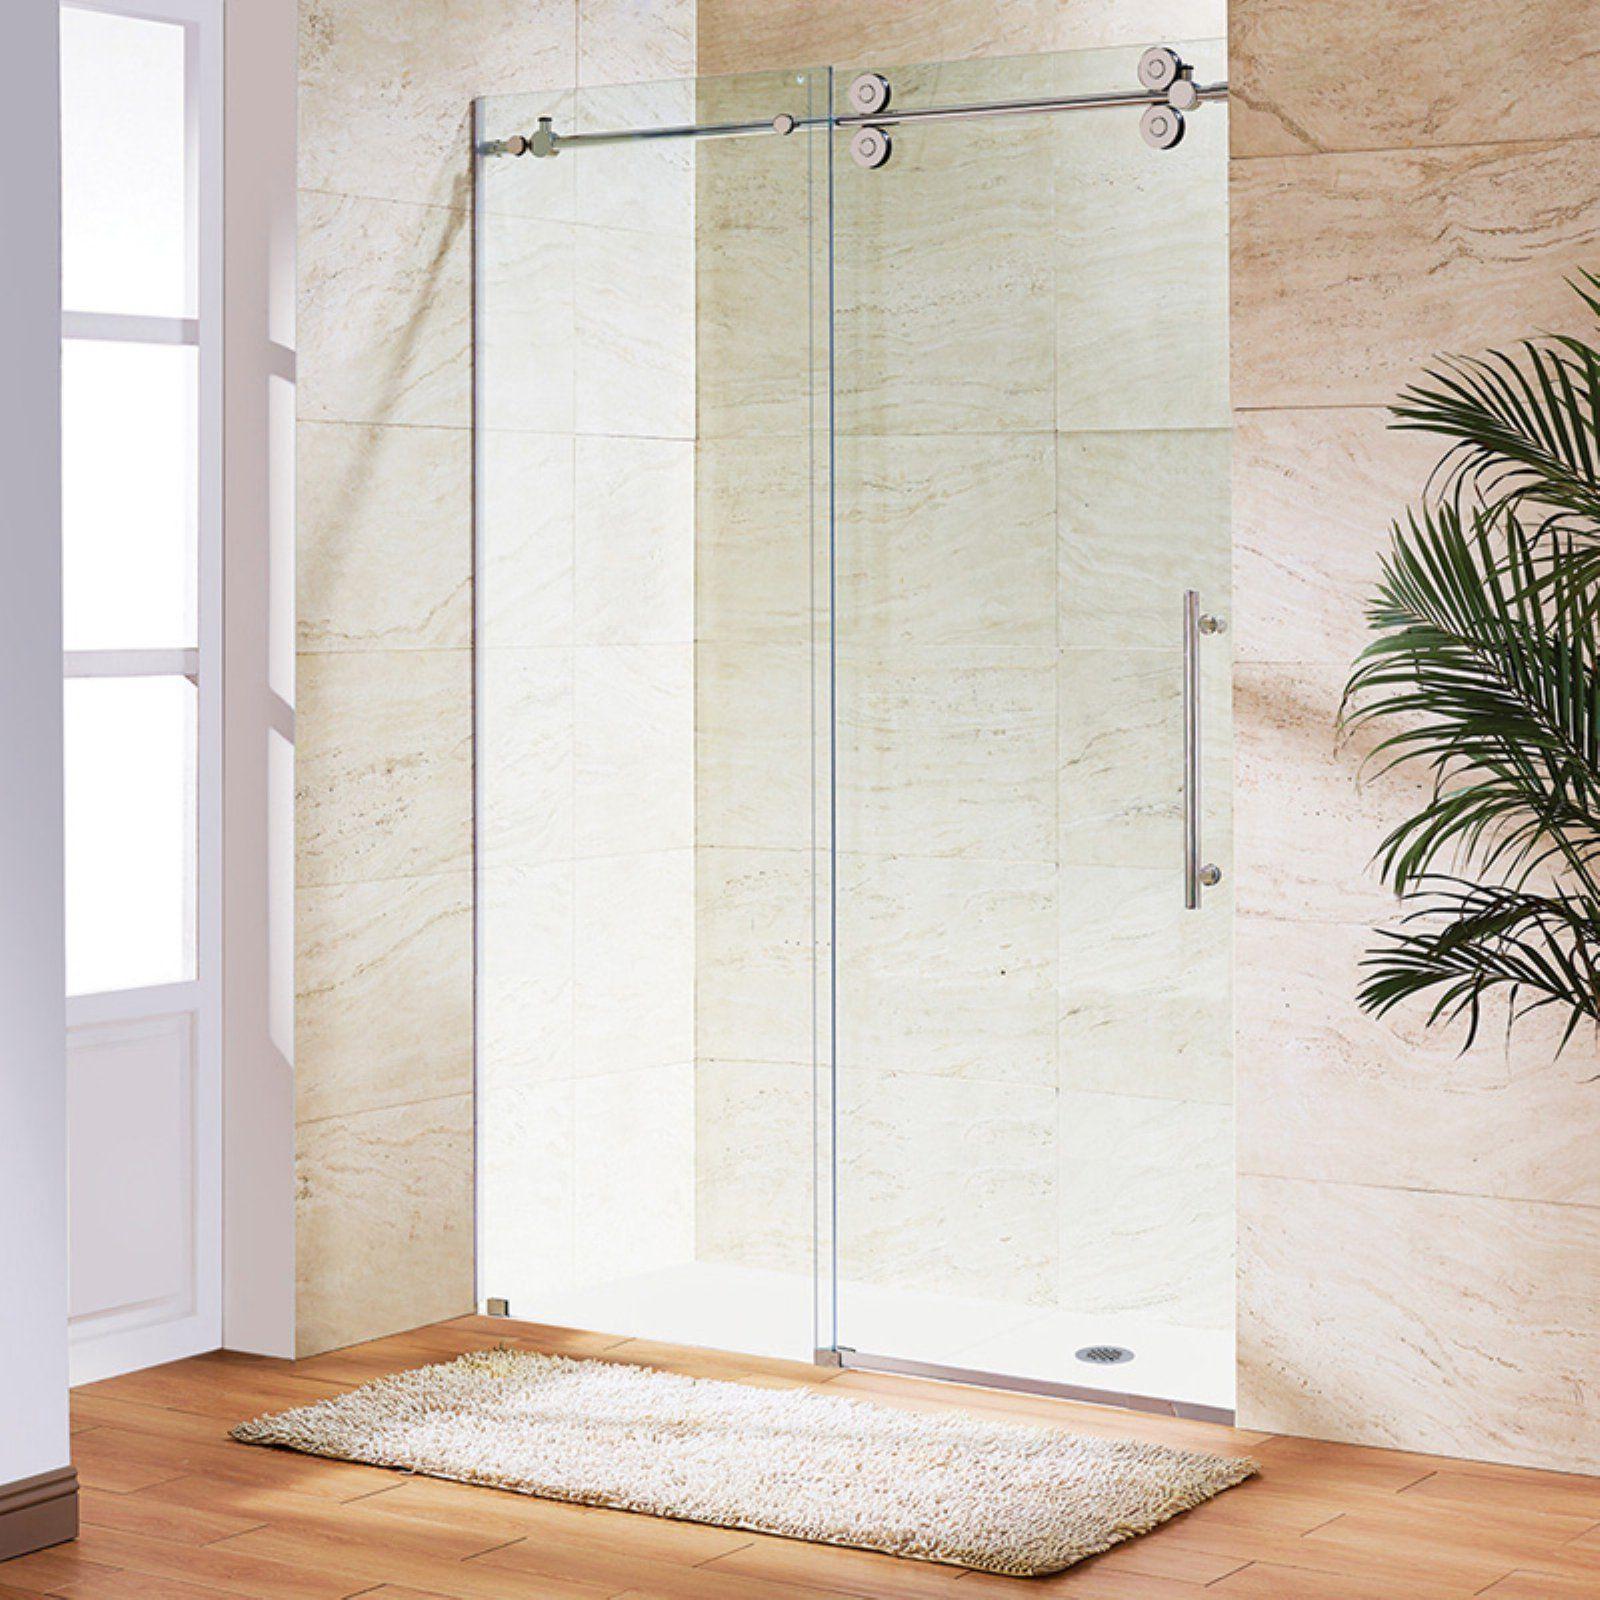 Vigo Vg60416066 60w X 66h In Clear Glass Bath Door Sliding